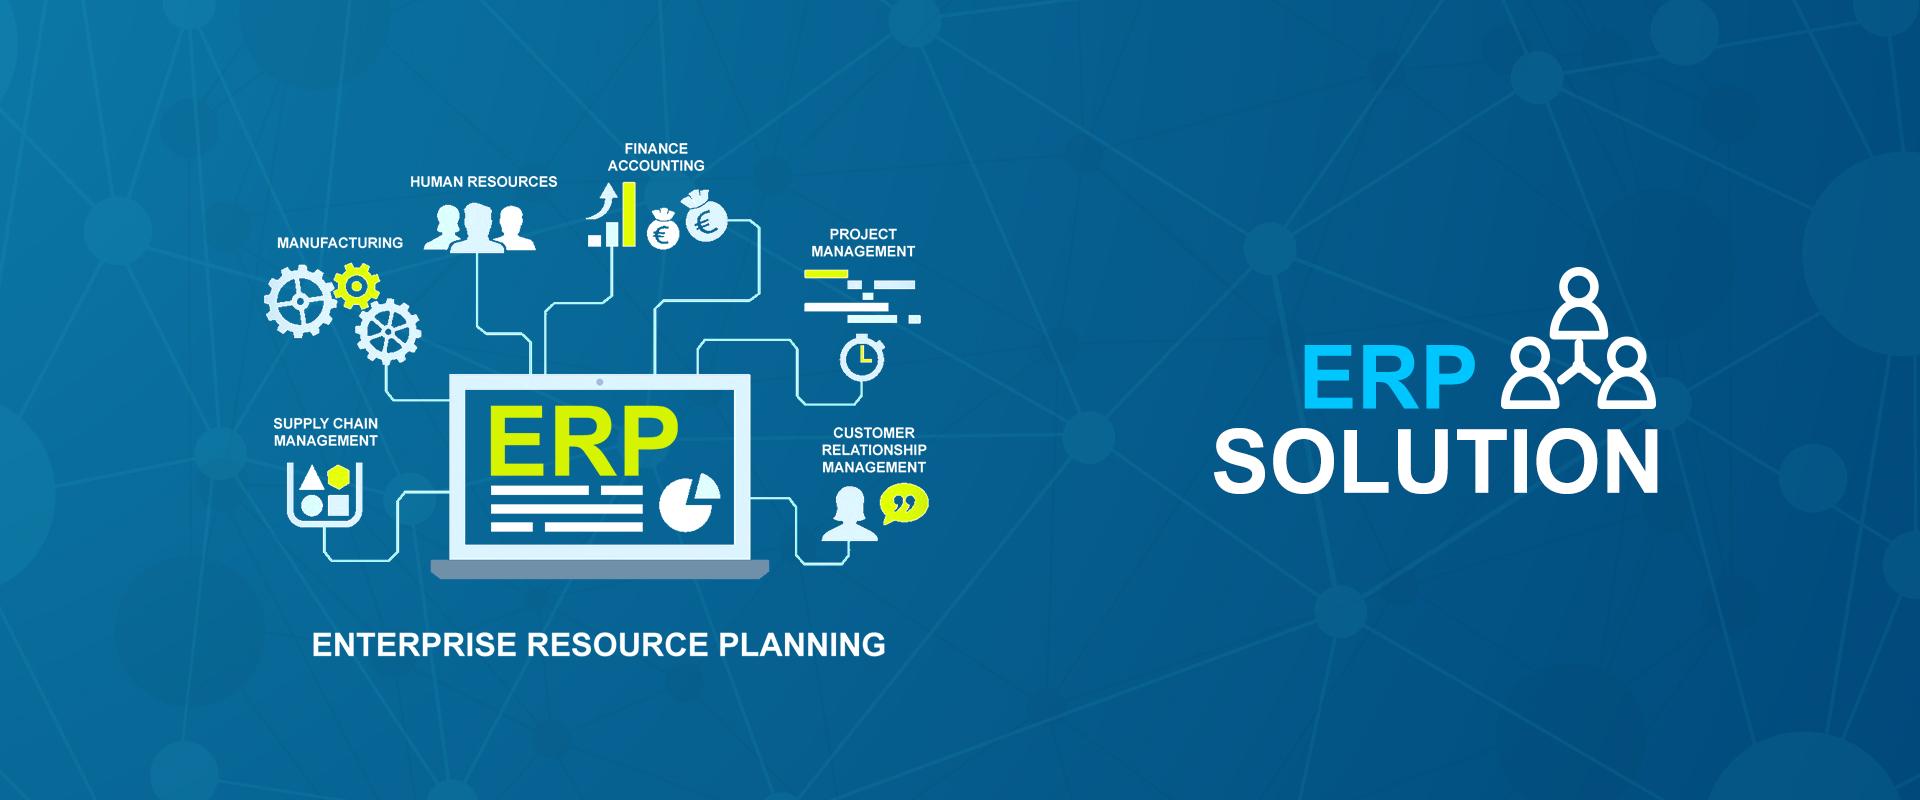 ERP - Enterprise Resource Planning System